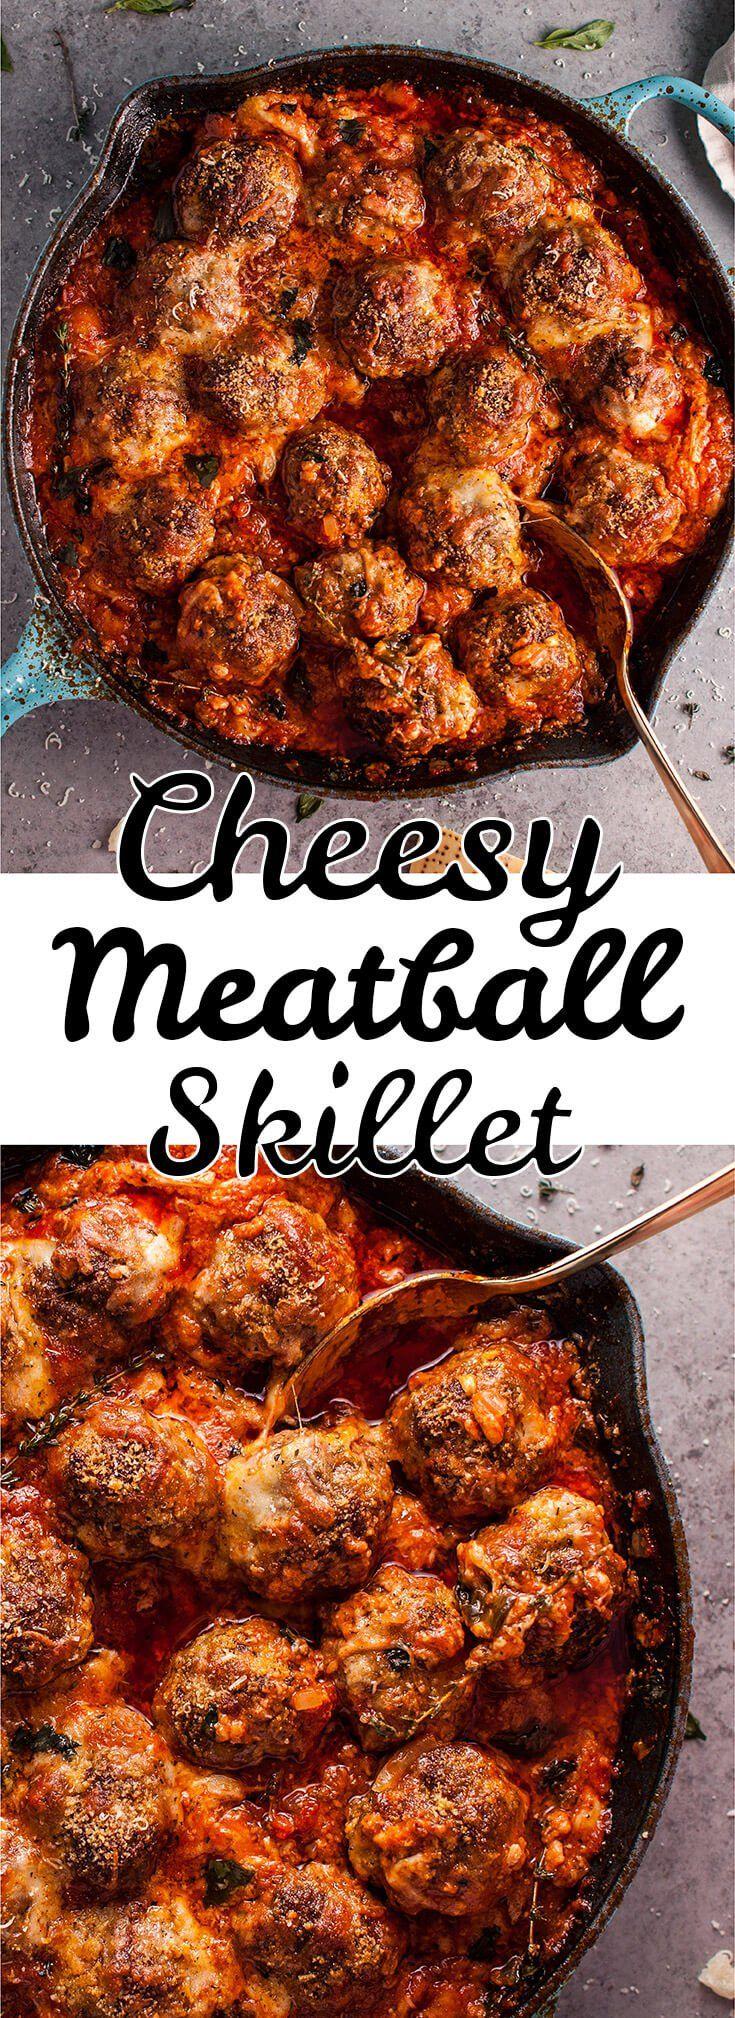 cheesy baked meatball skillet